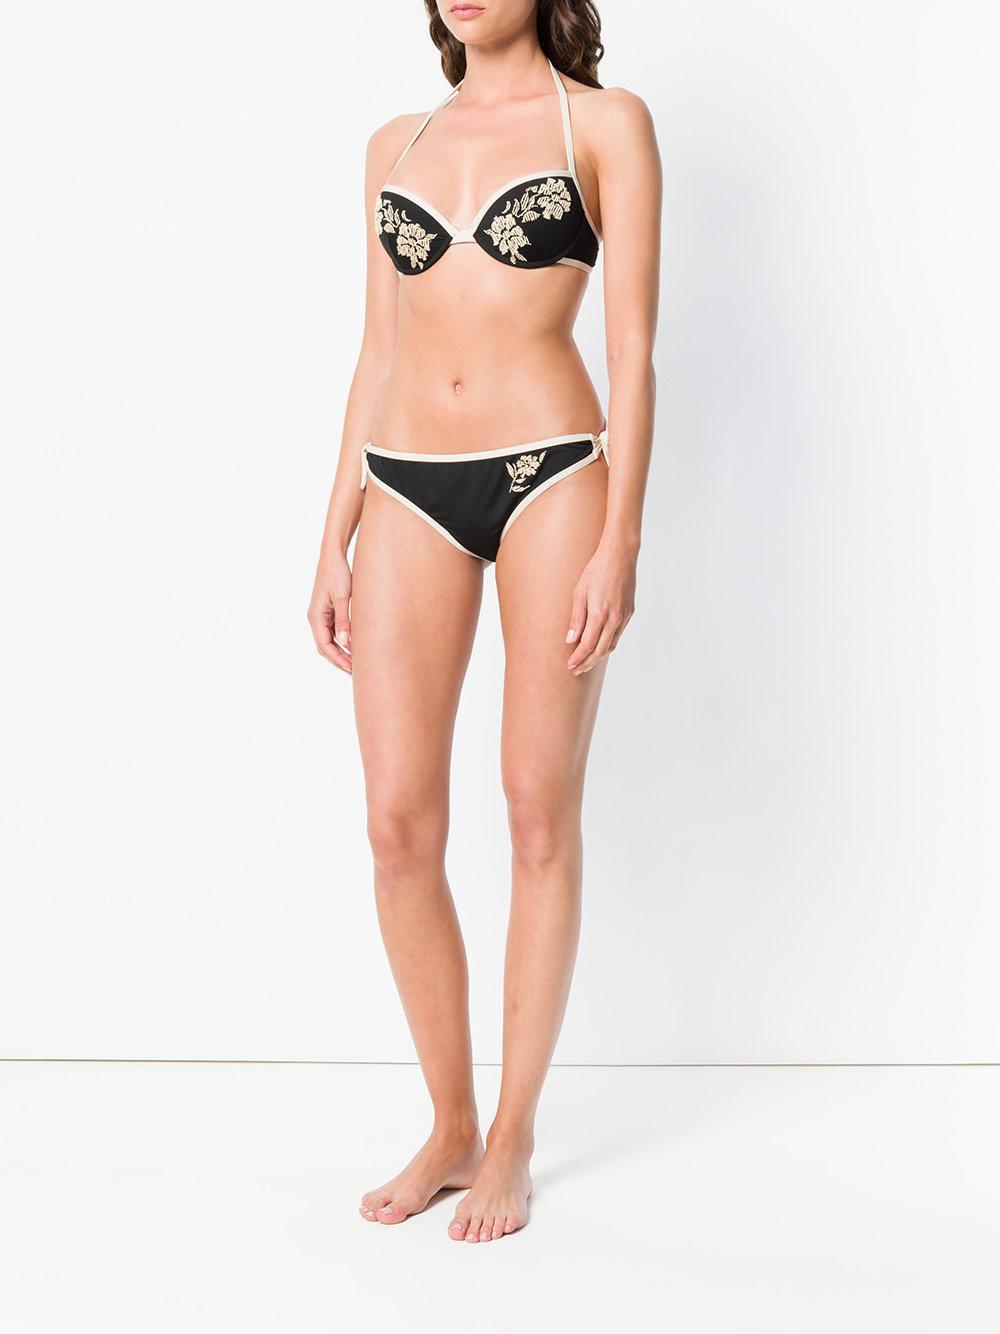 e2a19d3363 Fendi - Black Tan Floral Embroidered Bikini - Lyst. View fullscreen